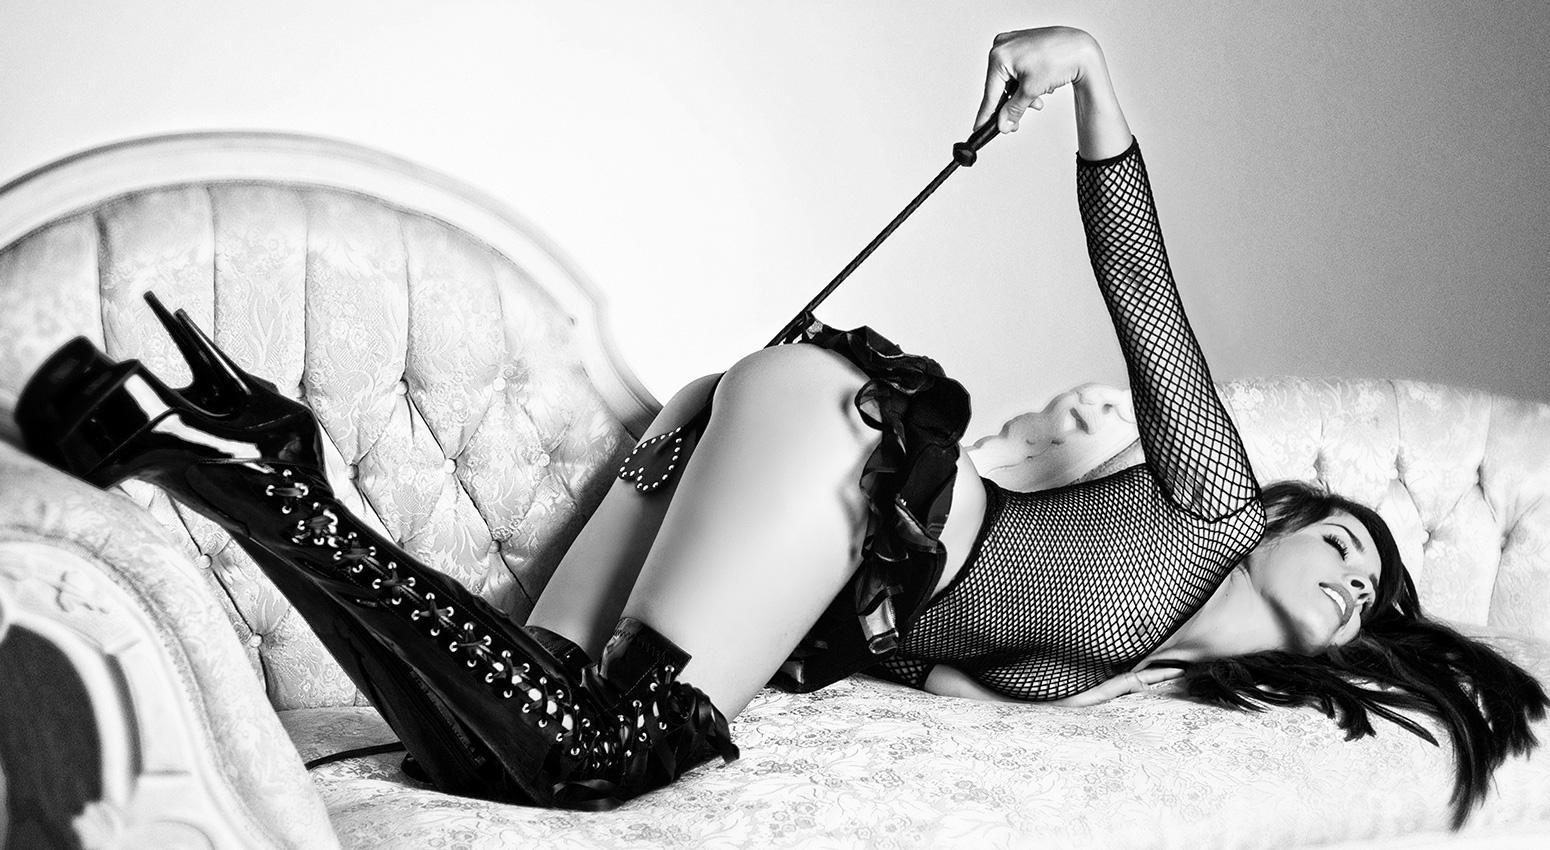 boudoir fetish pinup photography by Vixen Photography San